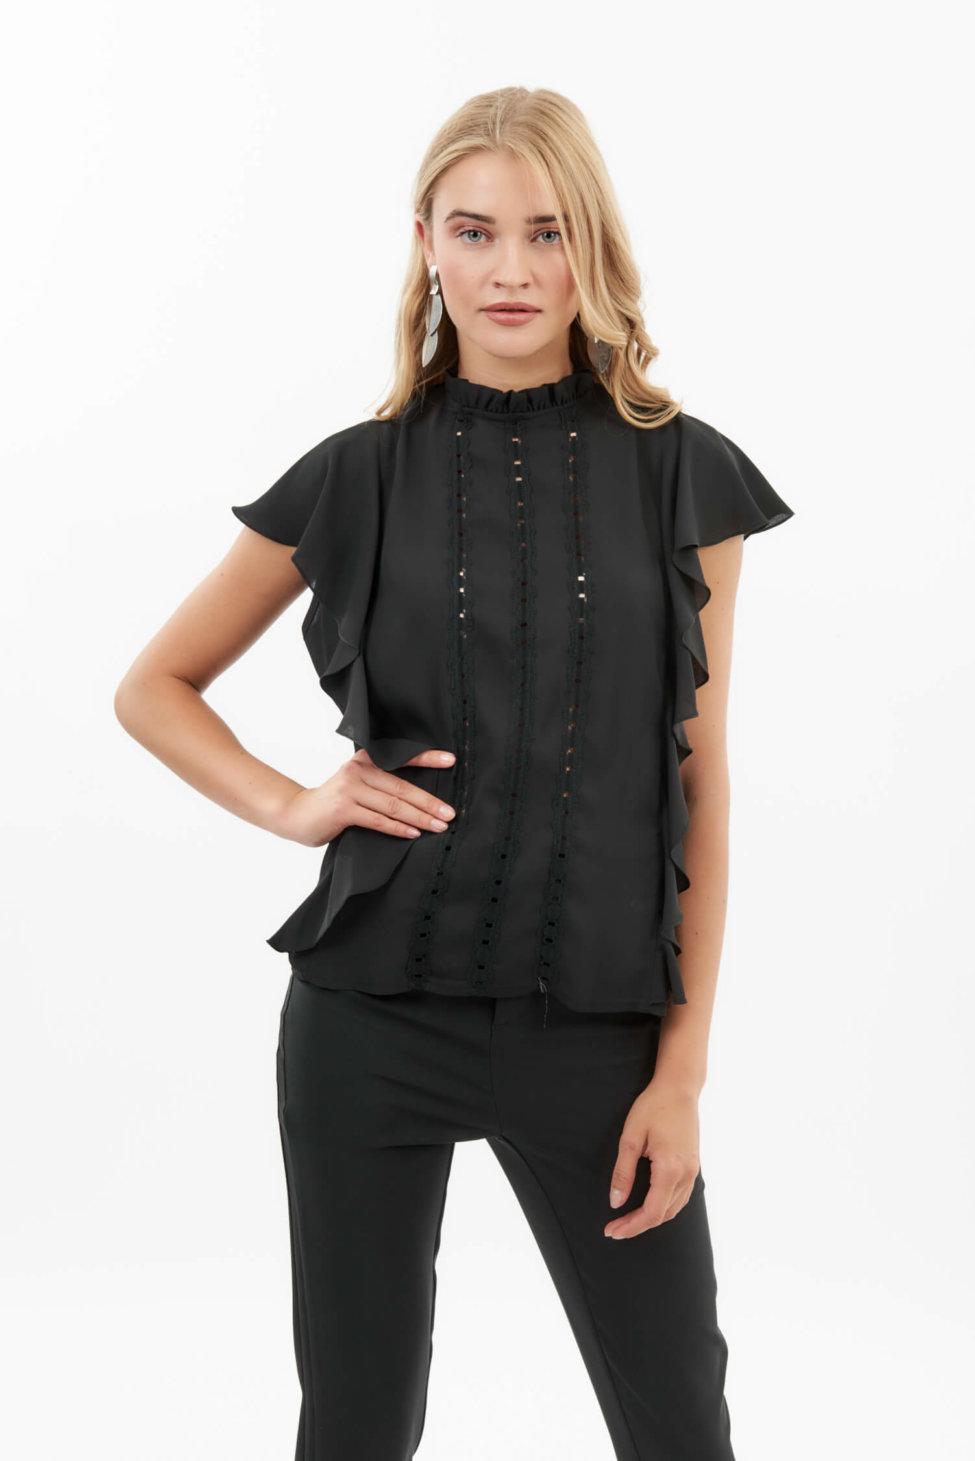 Litzy μπλούζα μαύρο